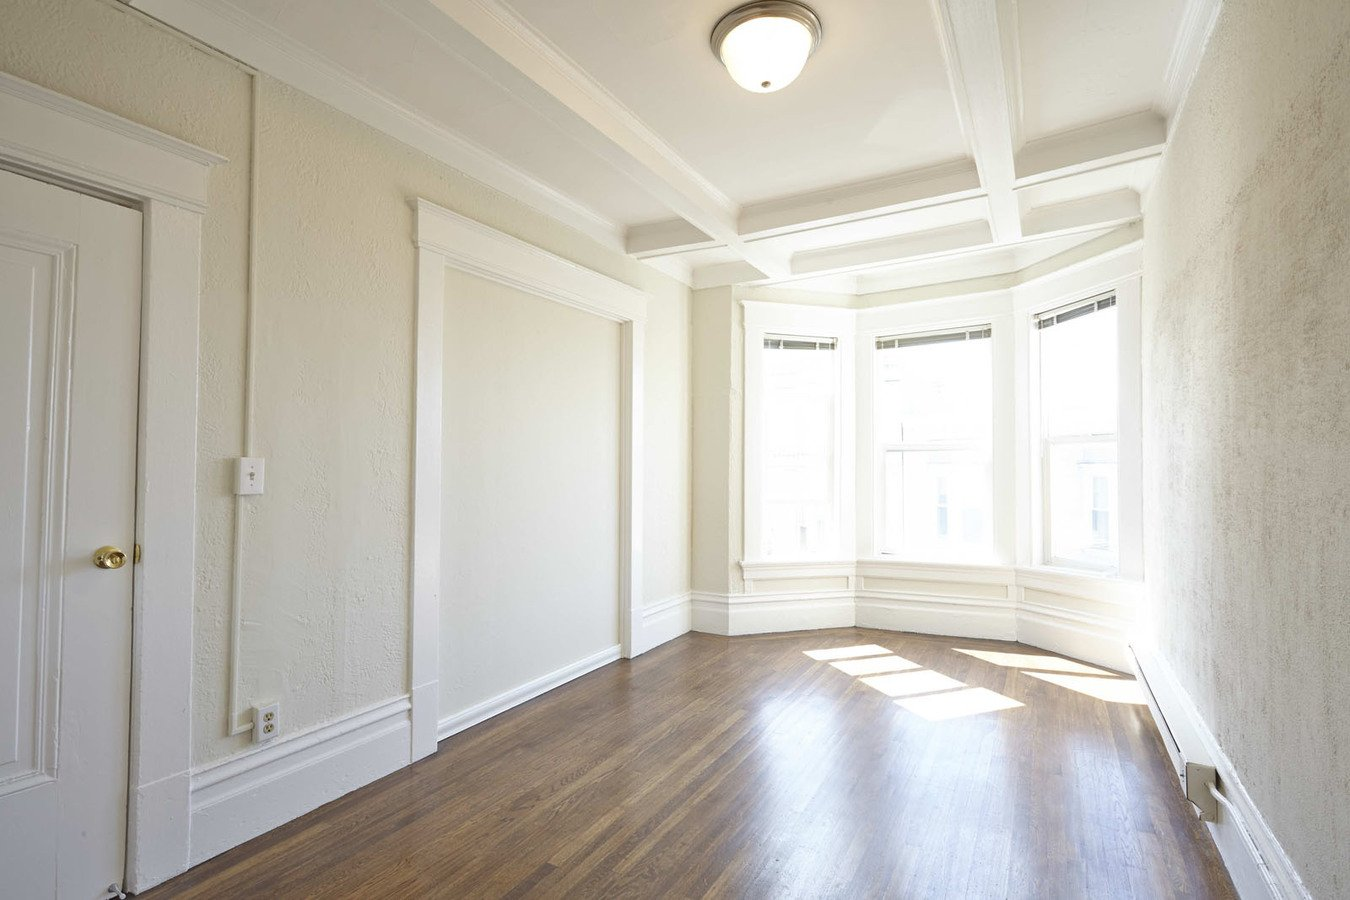 2 Bedrooms 1 Bathroom Apartment for rent at 1301 Leavenworth Apartments in San Francisco, CA